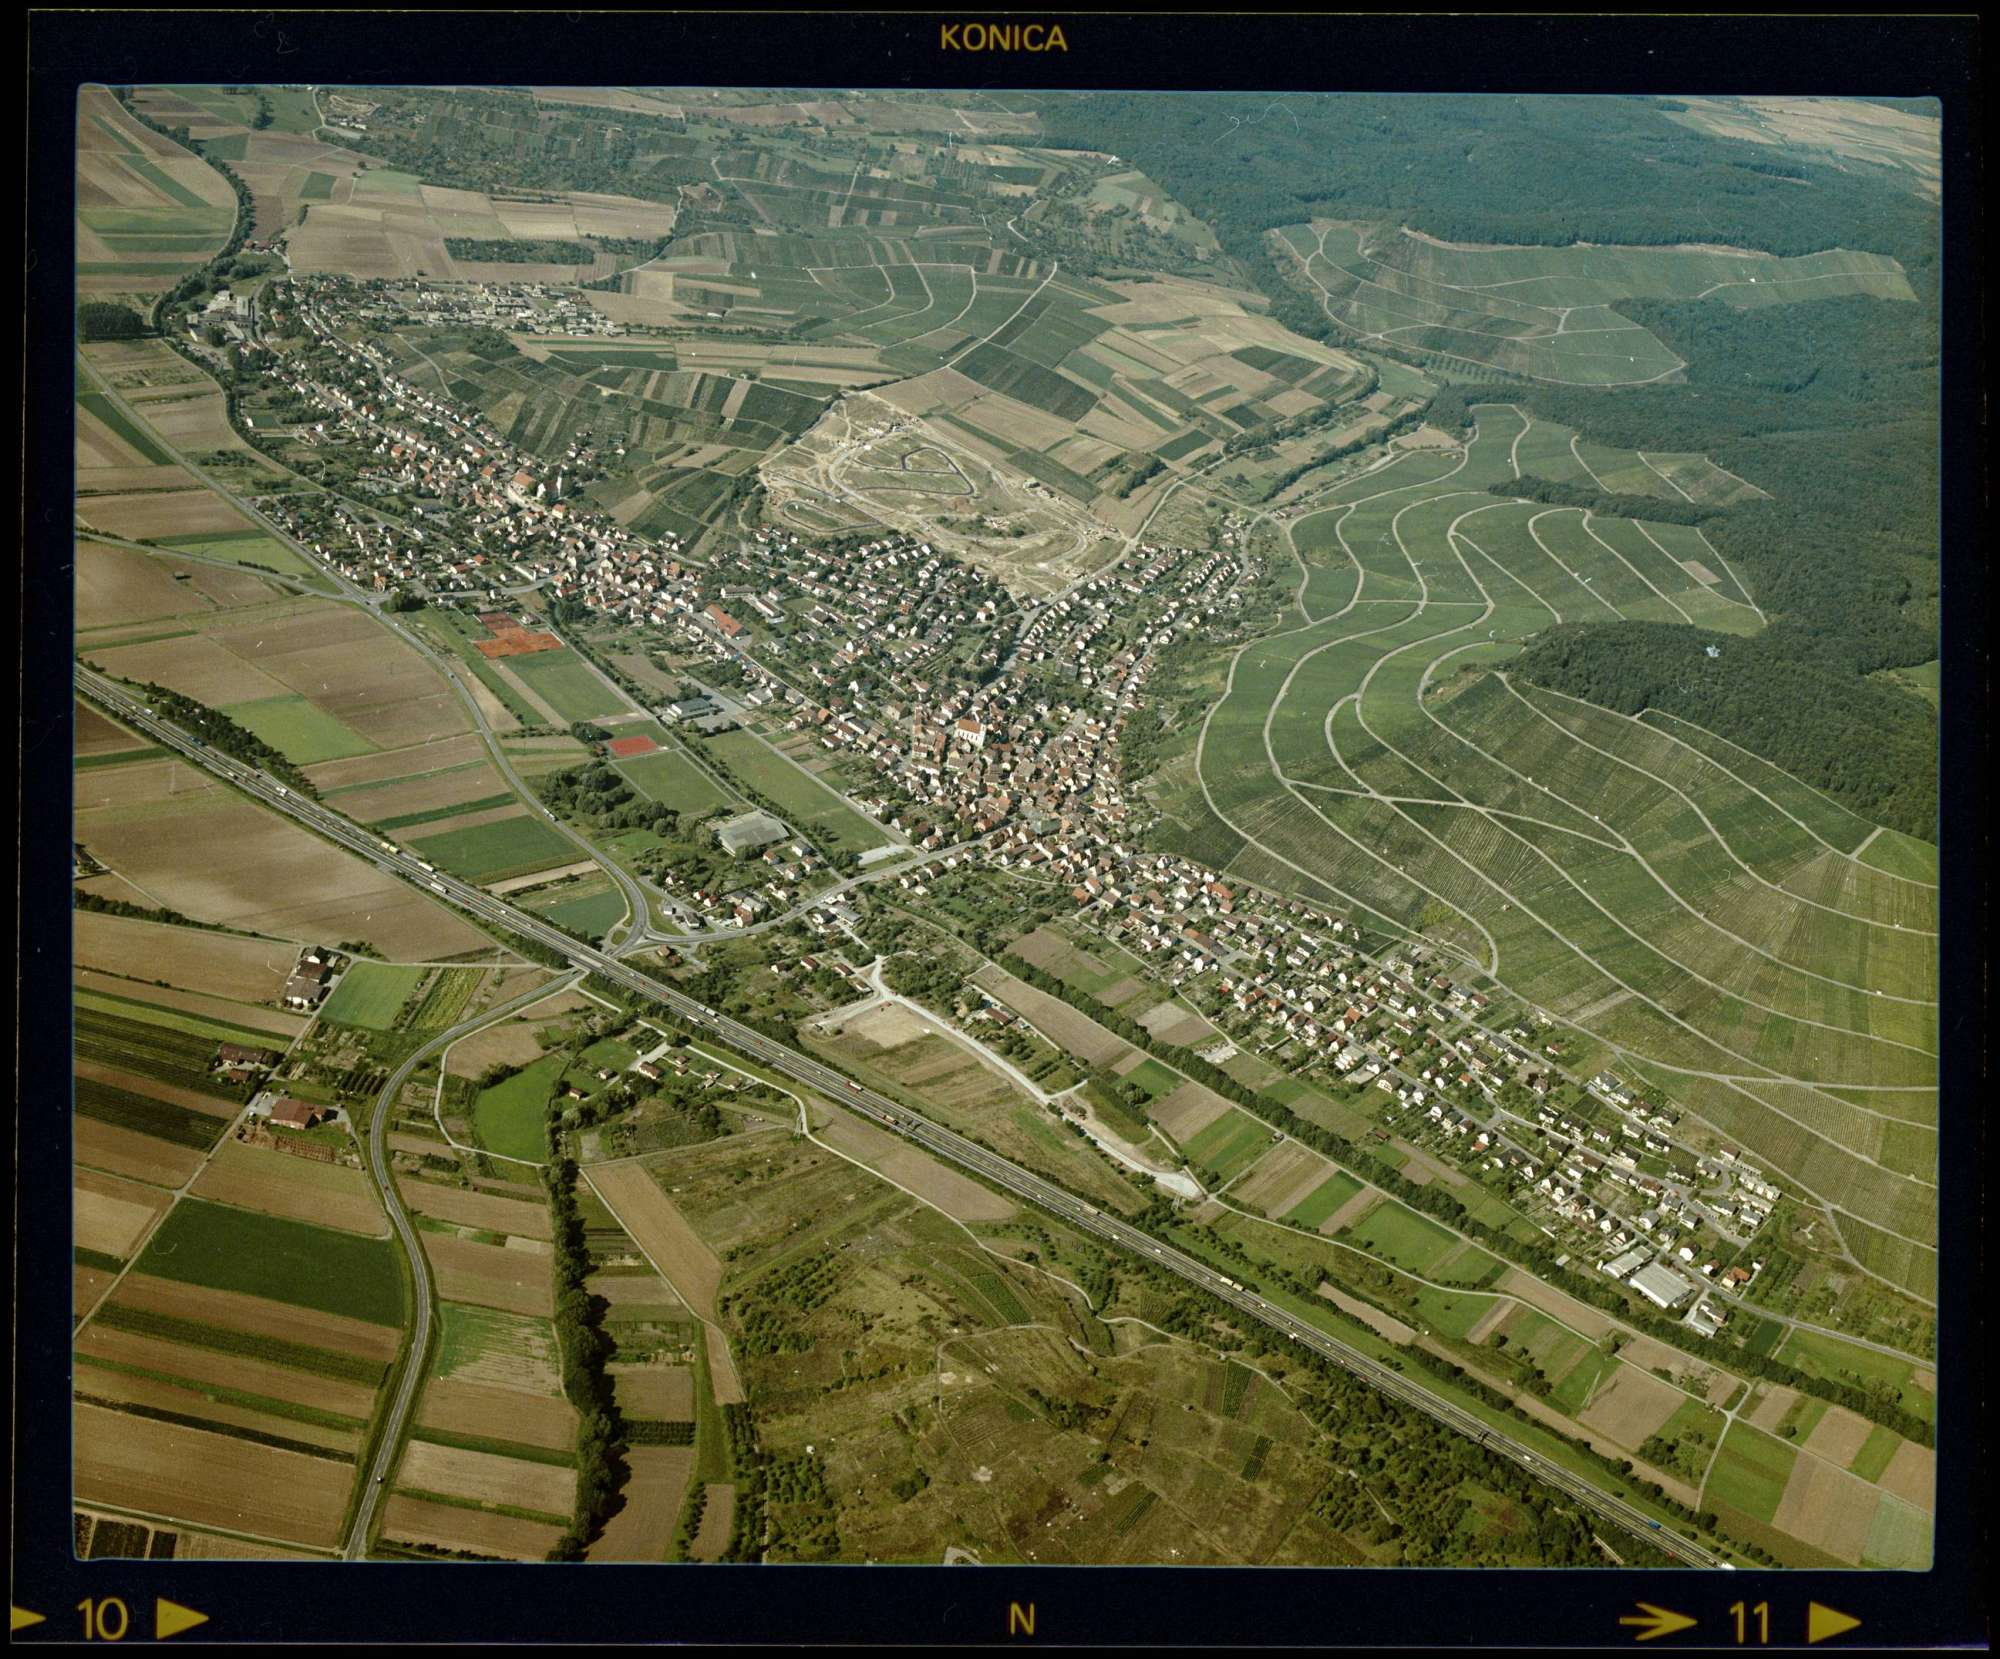 Erlenbach, Luftbild, Bild 1